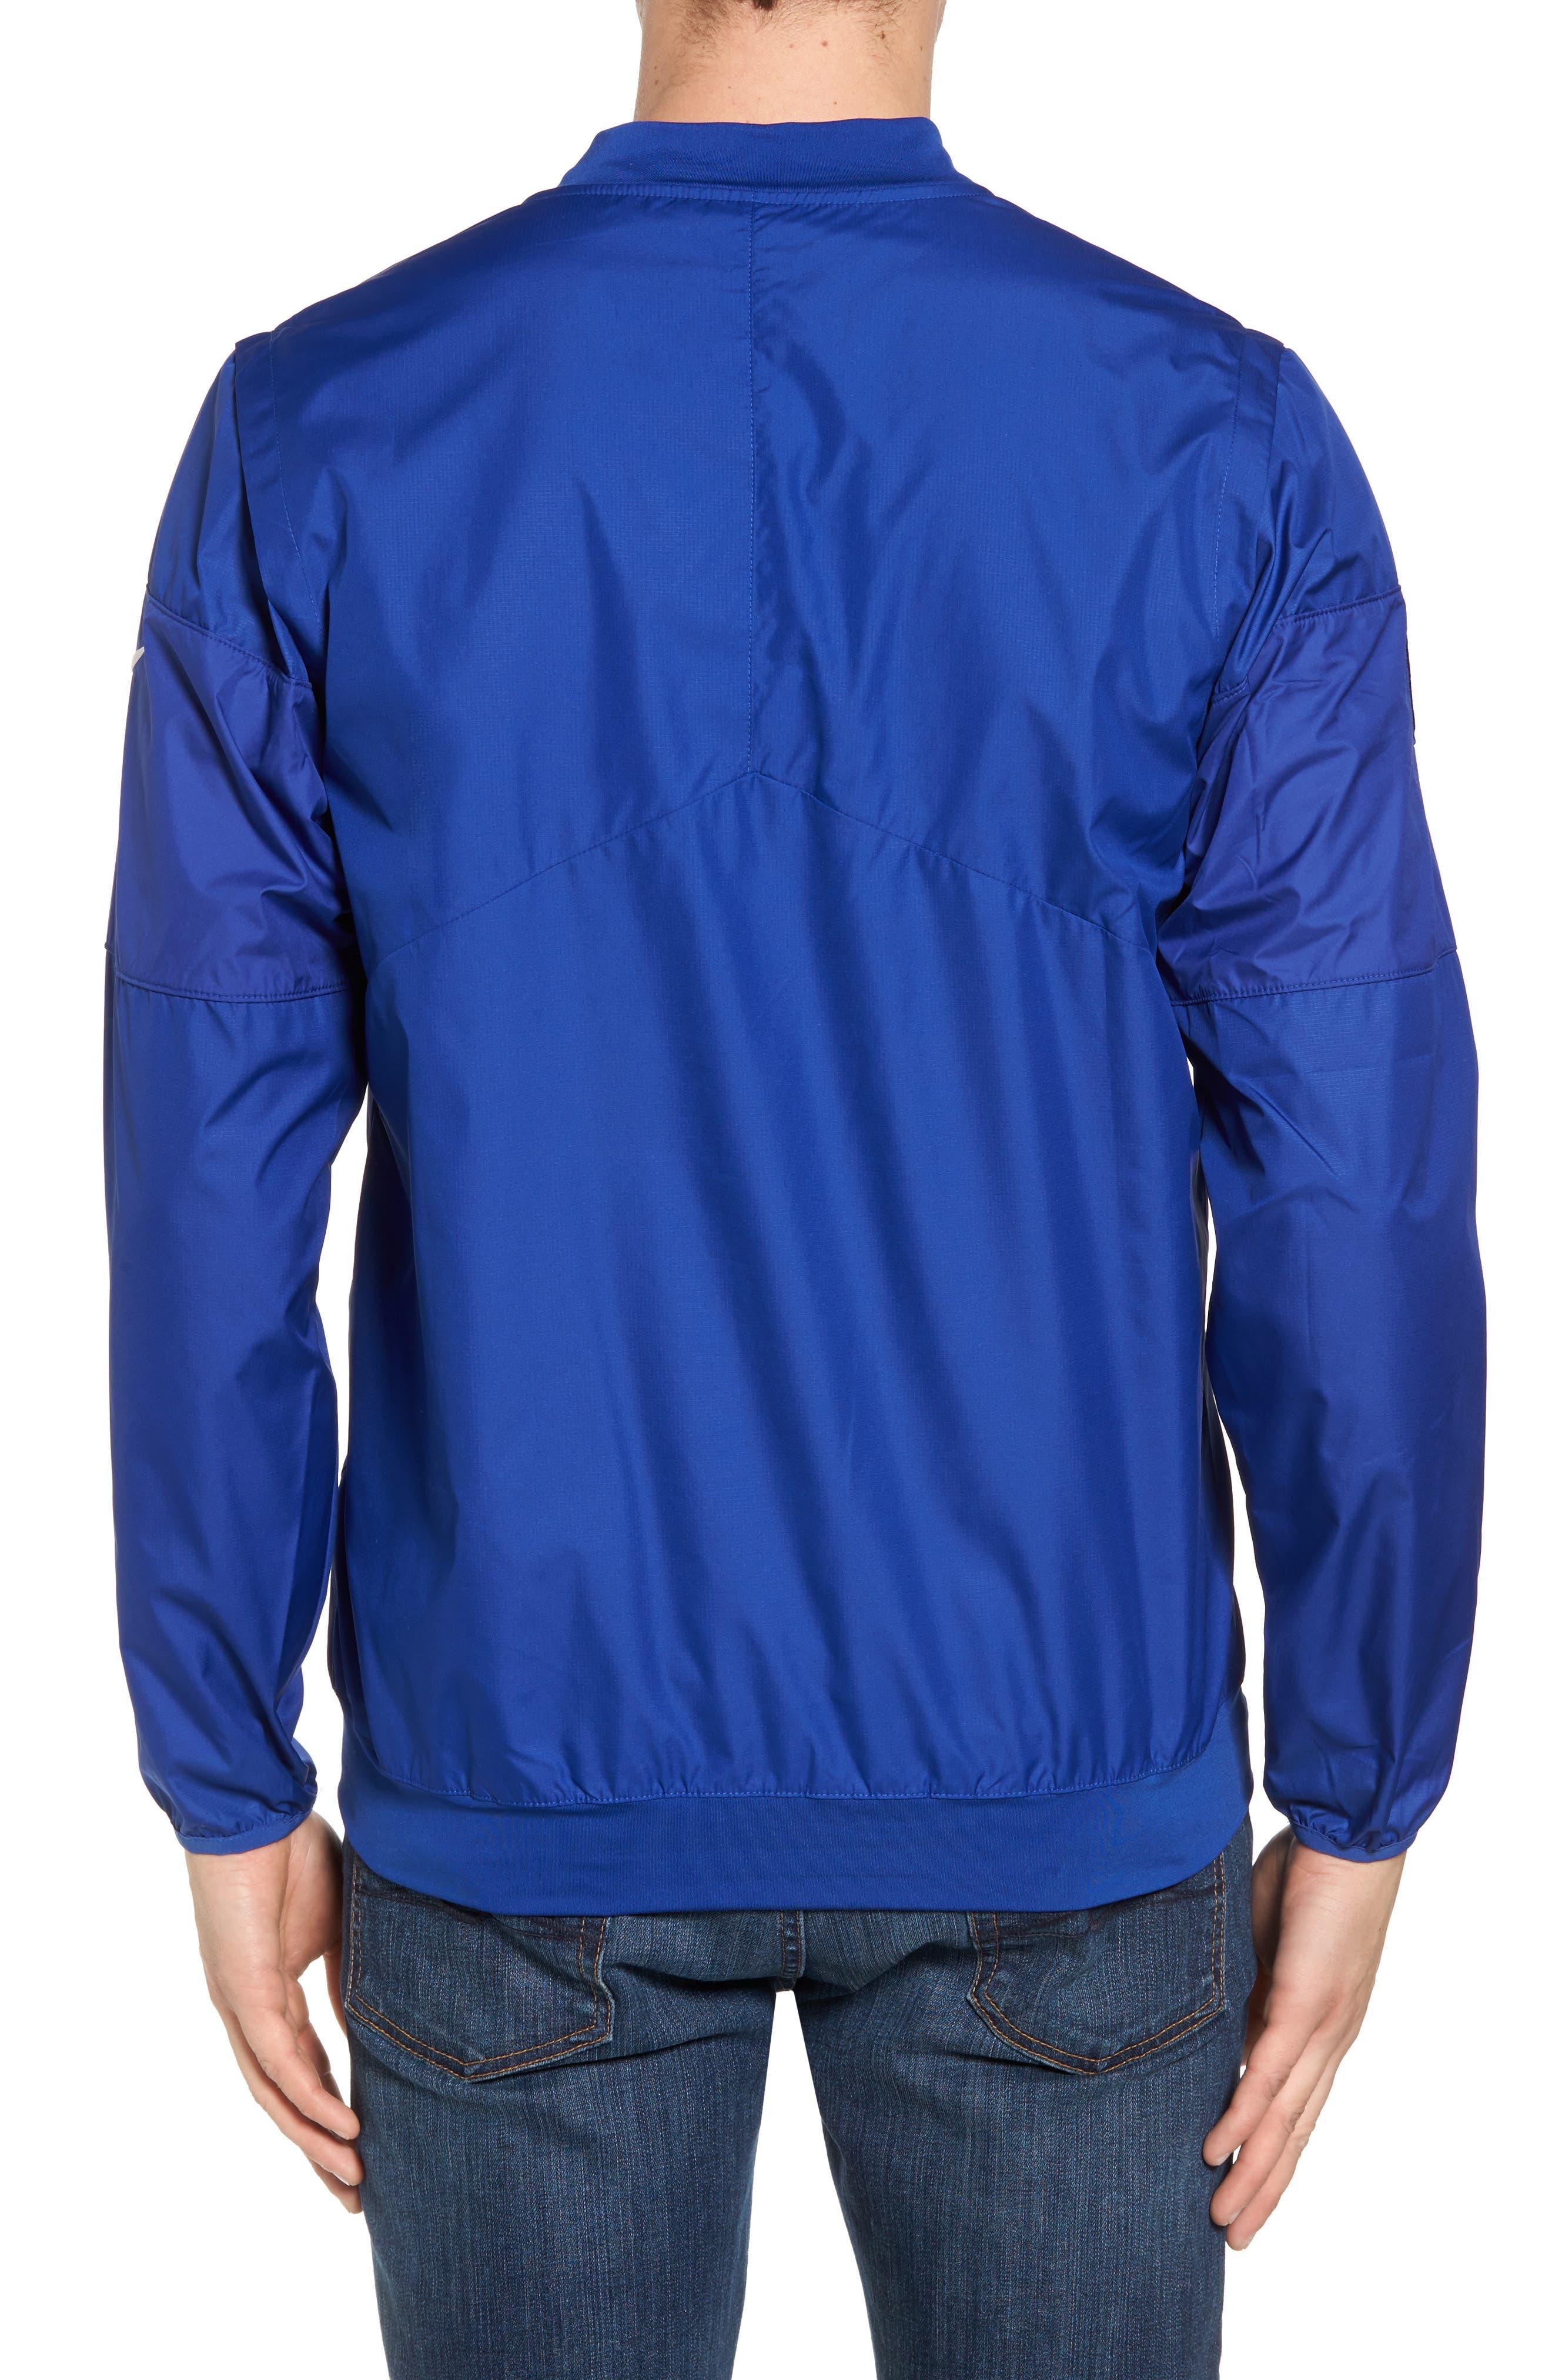 Lockdown NFL Pullover Jacket,                             Alternate thumbnail 10, color,